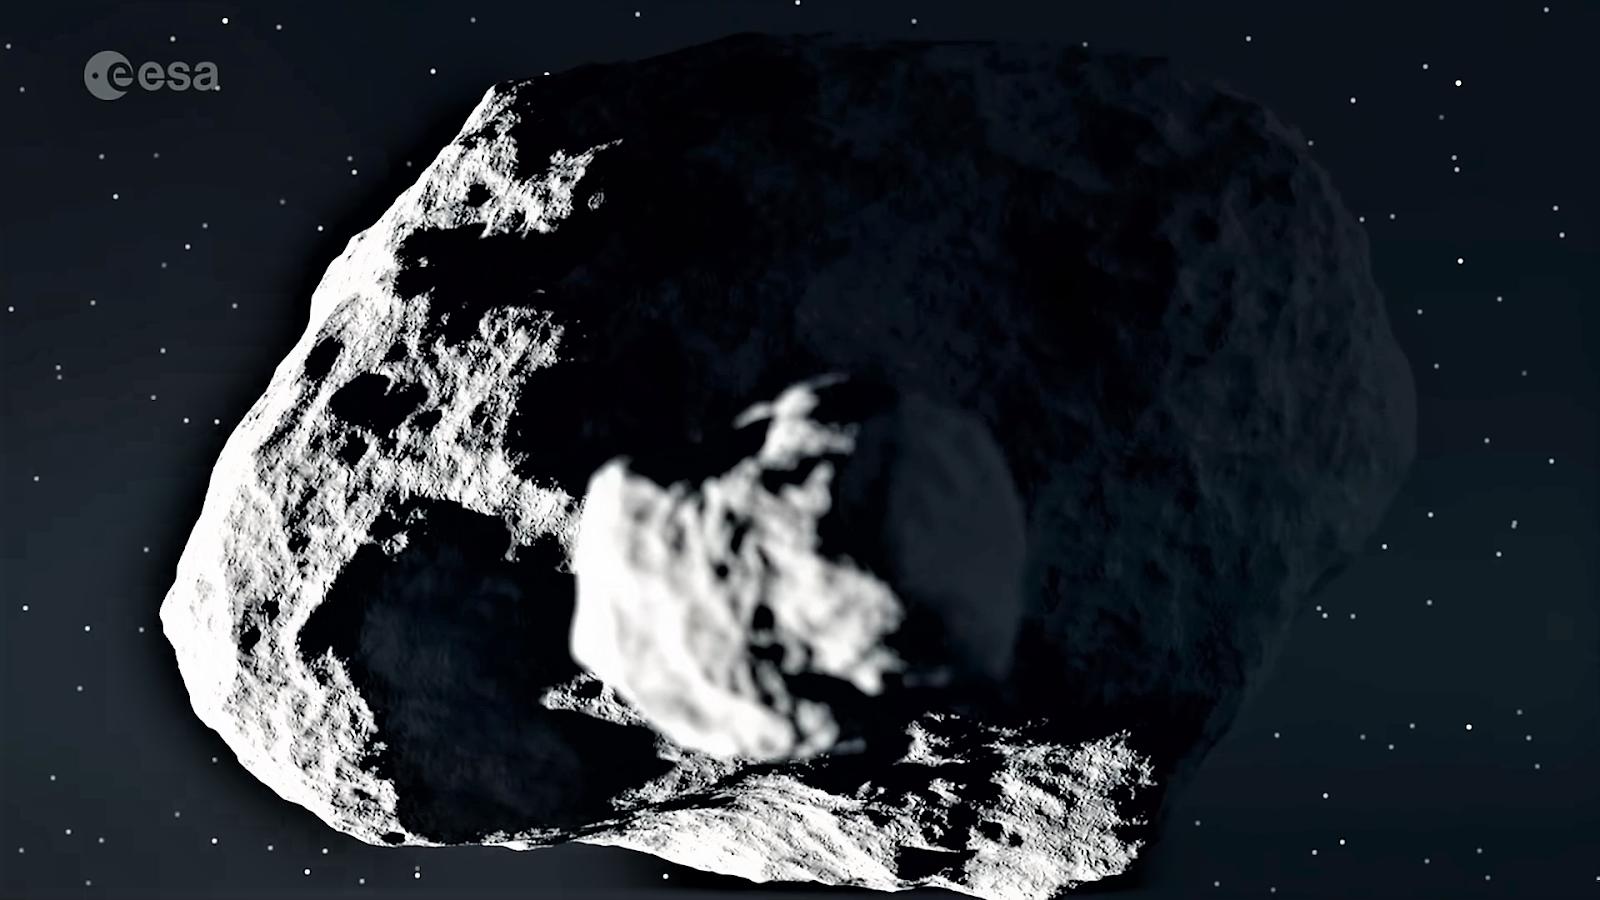 Hera planetary defence mission